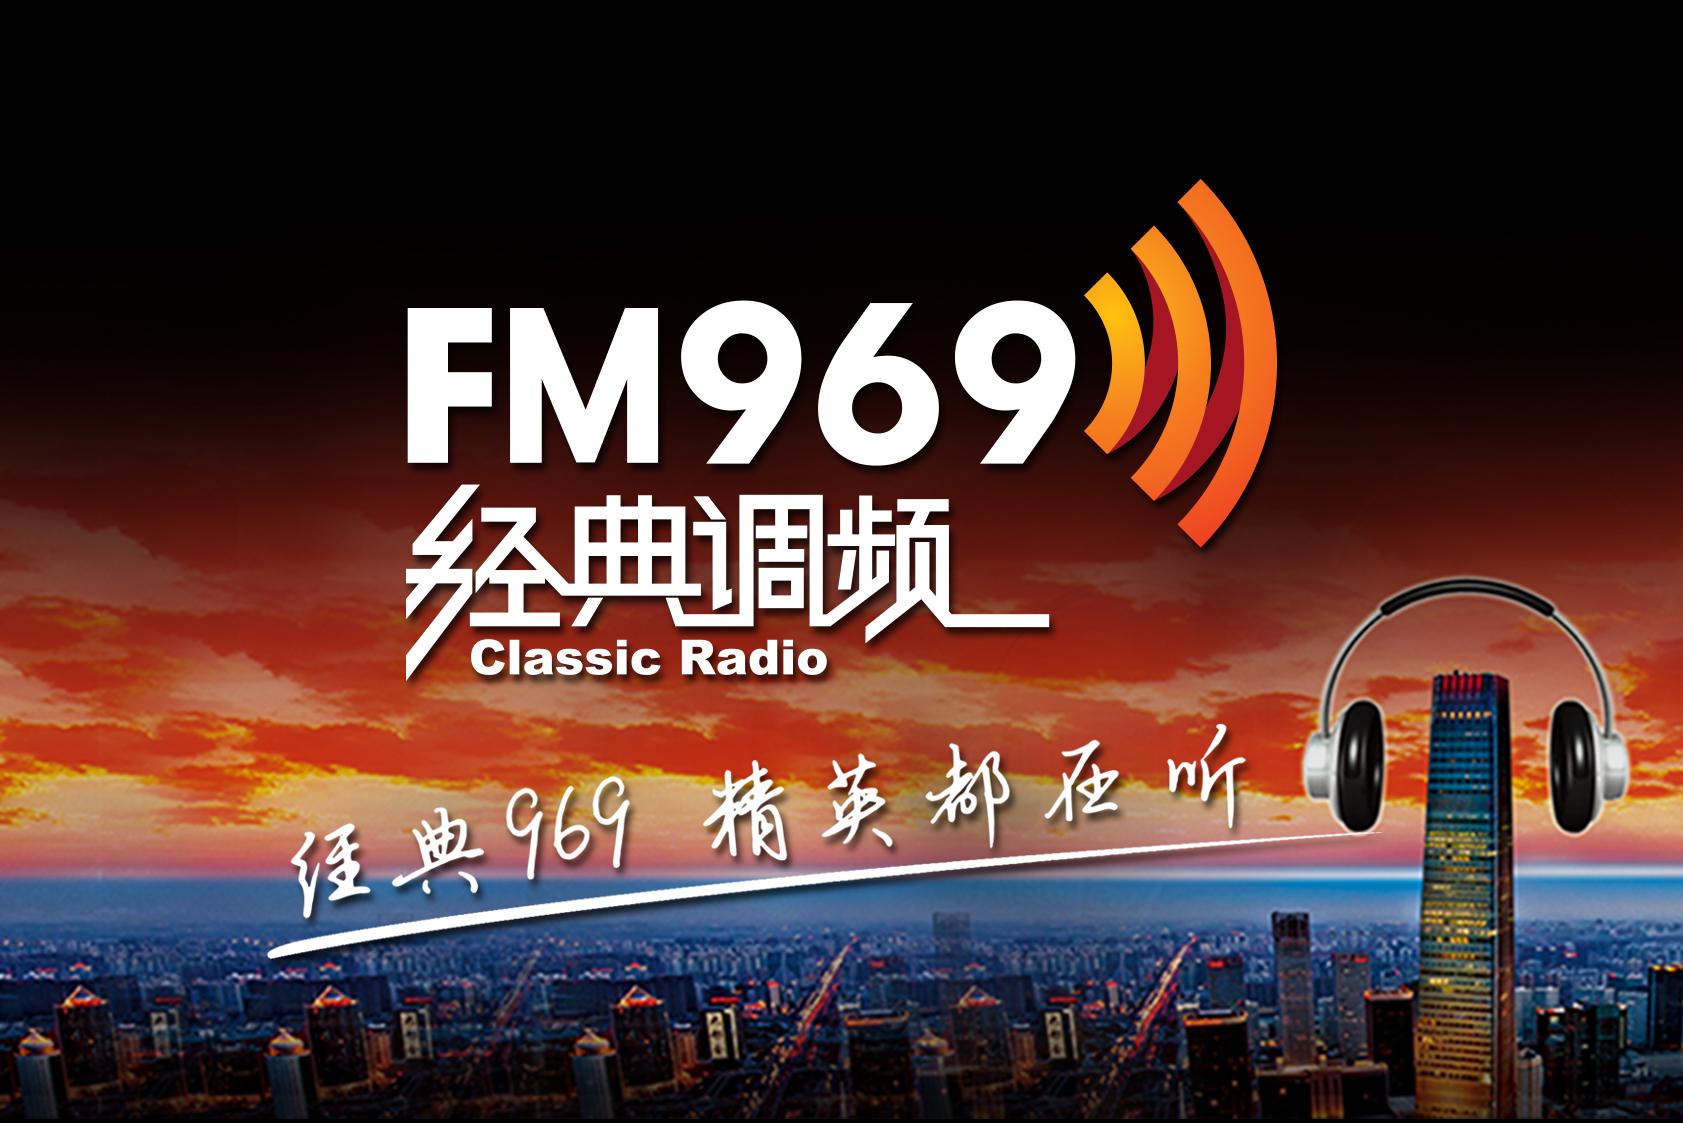 FM969